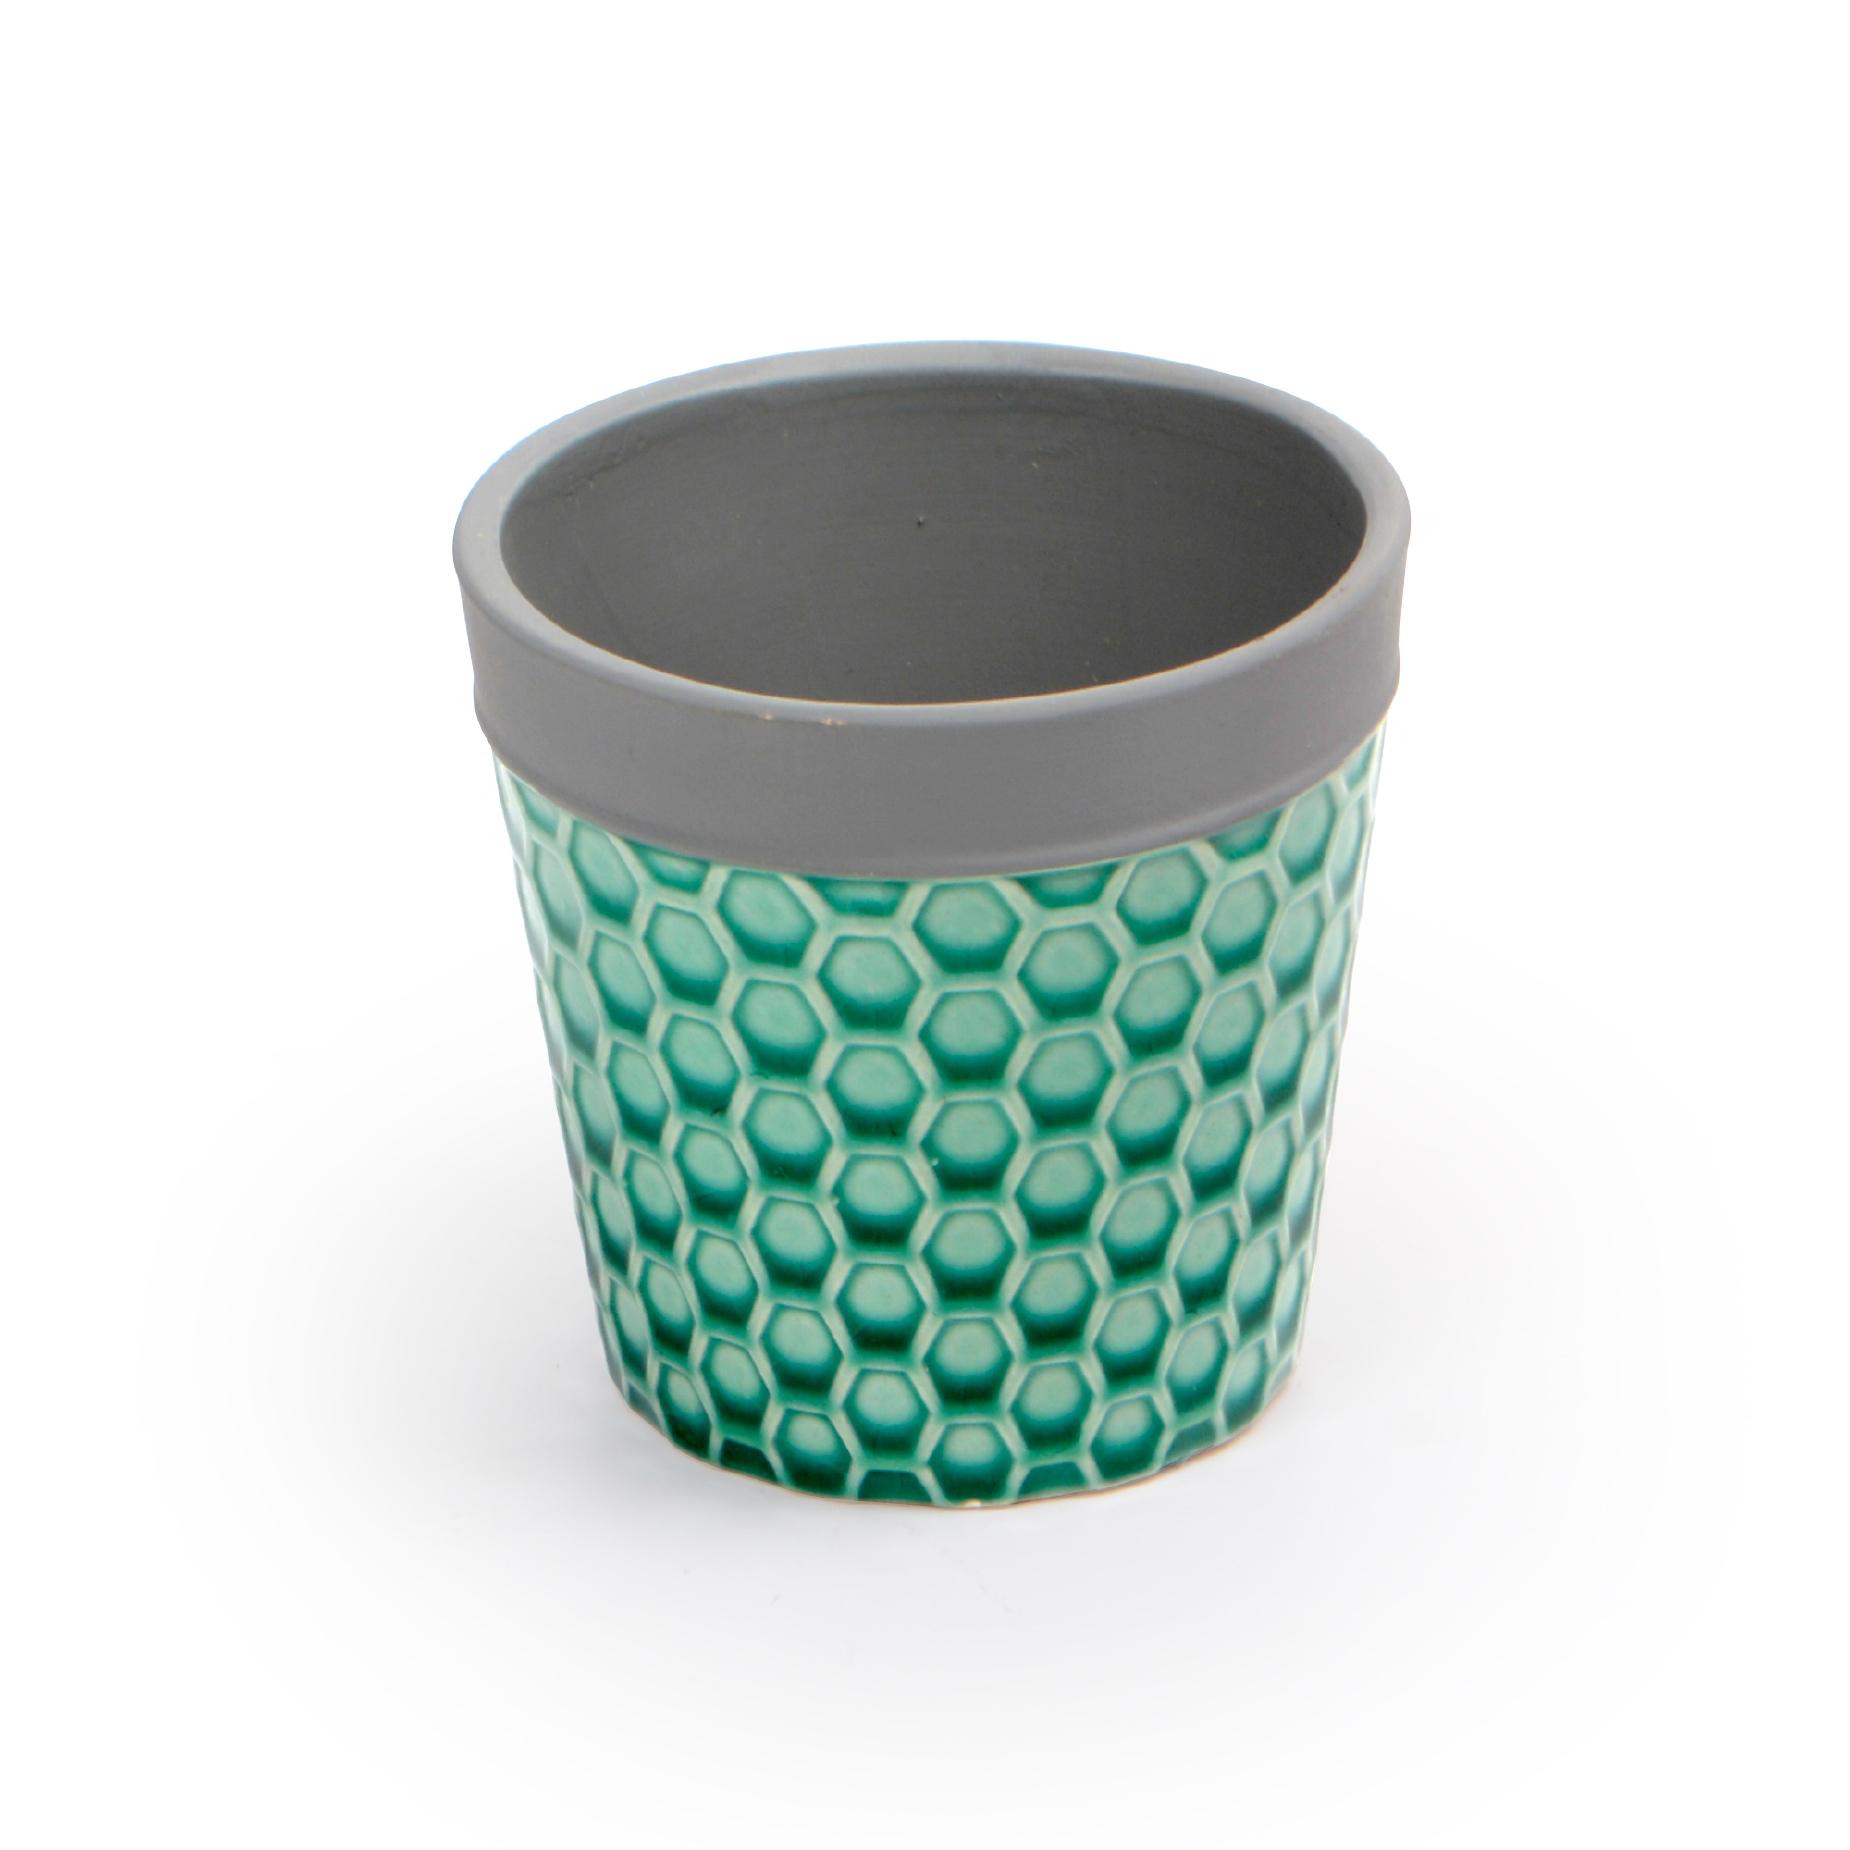 Cachepô médio de Cerâmica